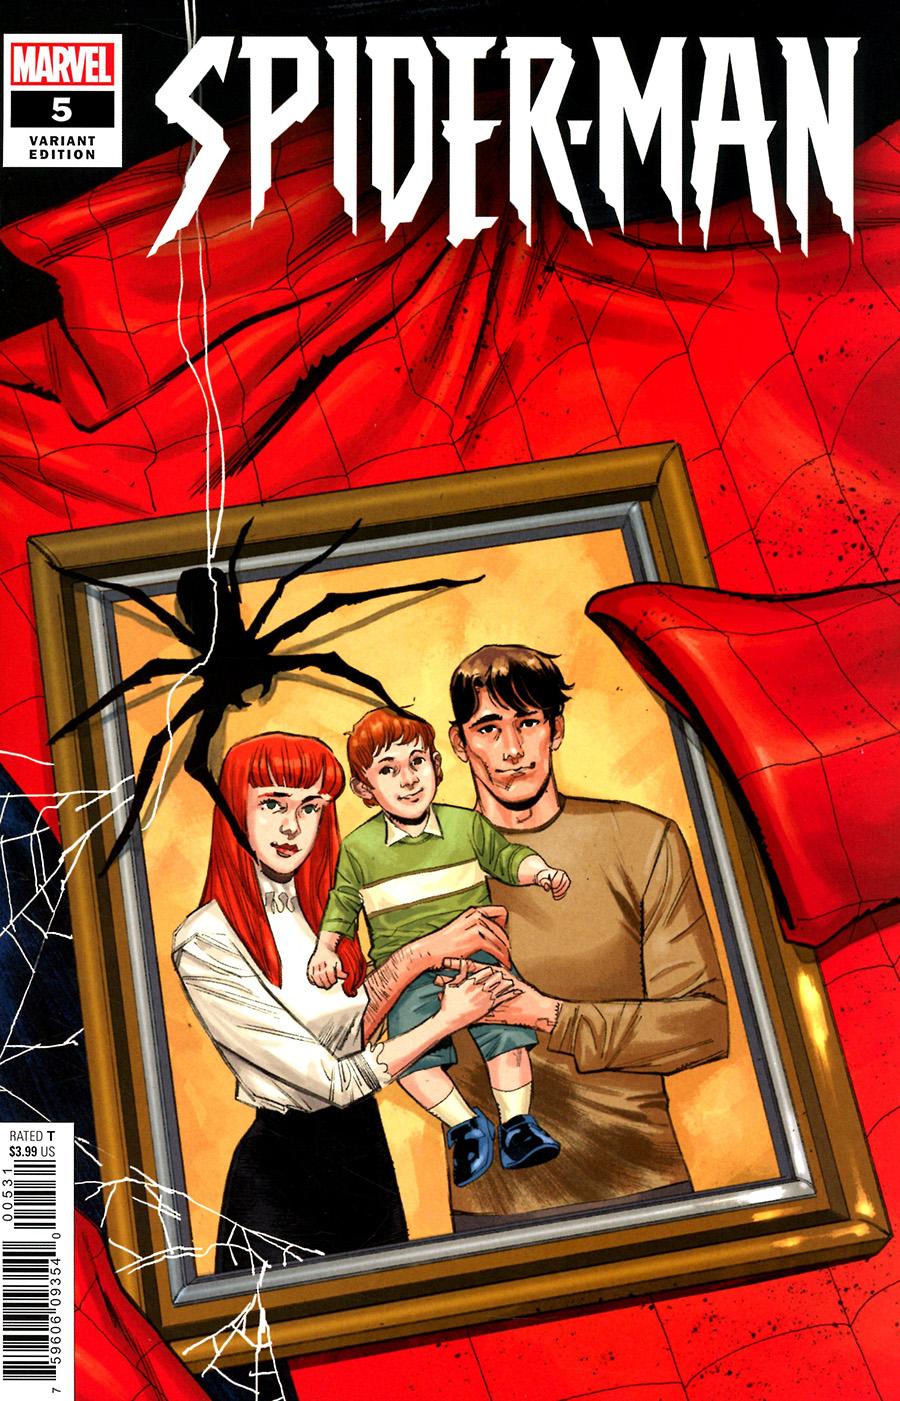 Spider-Man Vol 3 #5 Cover C Incentive Sara Pichelli Variant Cover